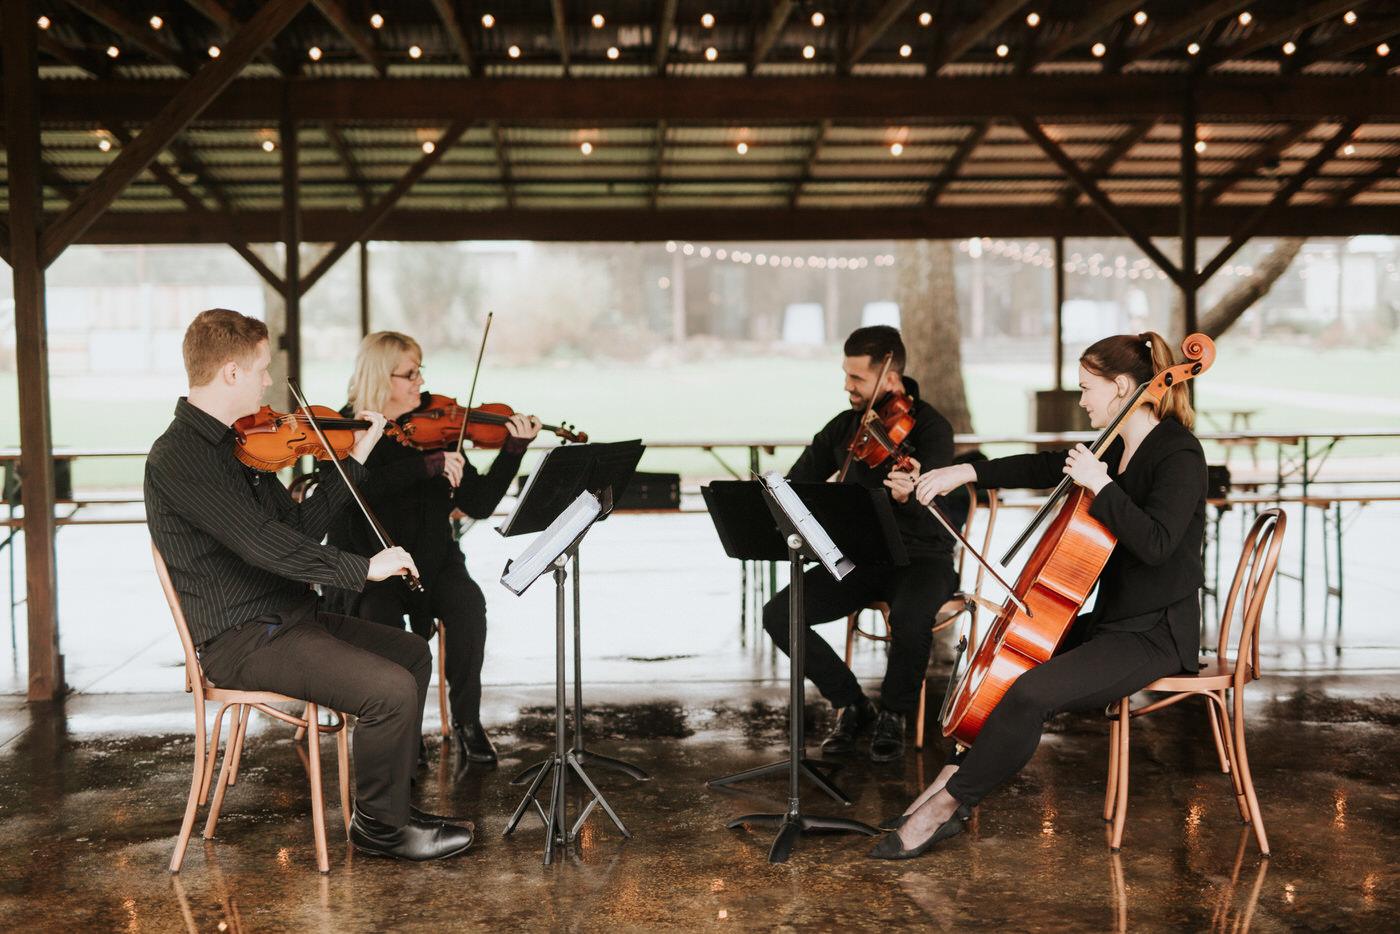 Terra Vista musicians playing at wedding